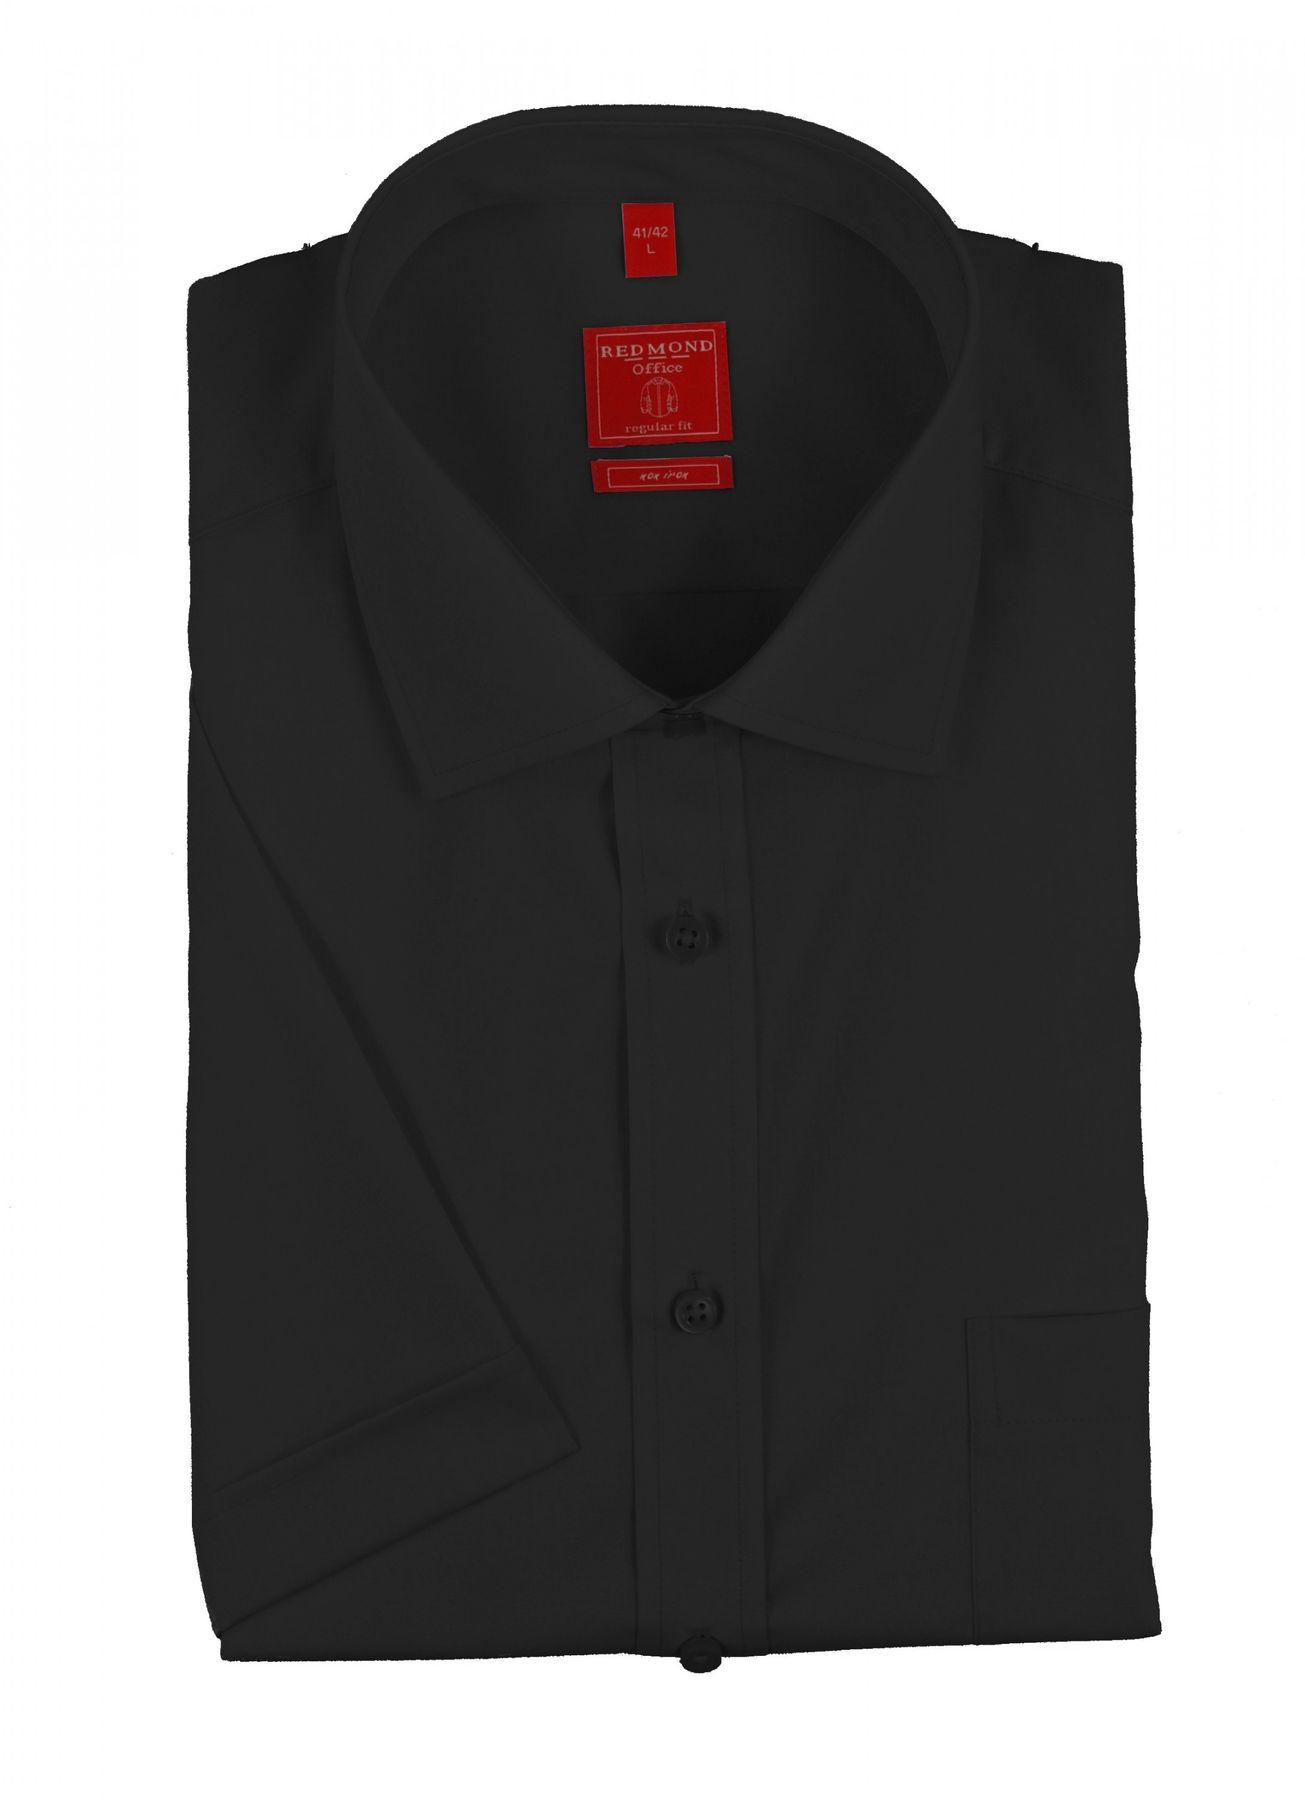 Redmond - Regular Fit - Herren Kurzarm Hemd mit Kent-Kragen in verschiedenen Farben (150920 A) – Bild 1